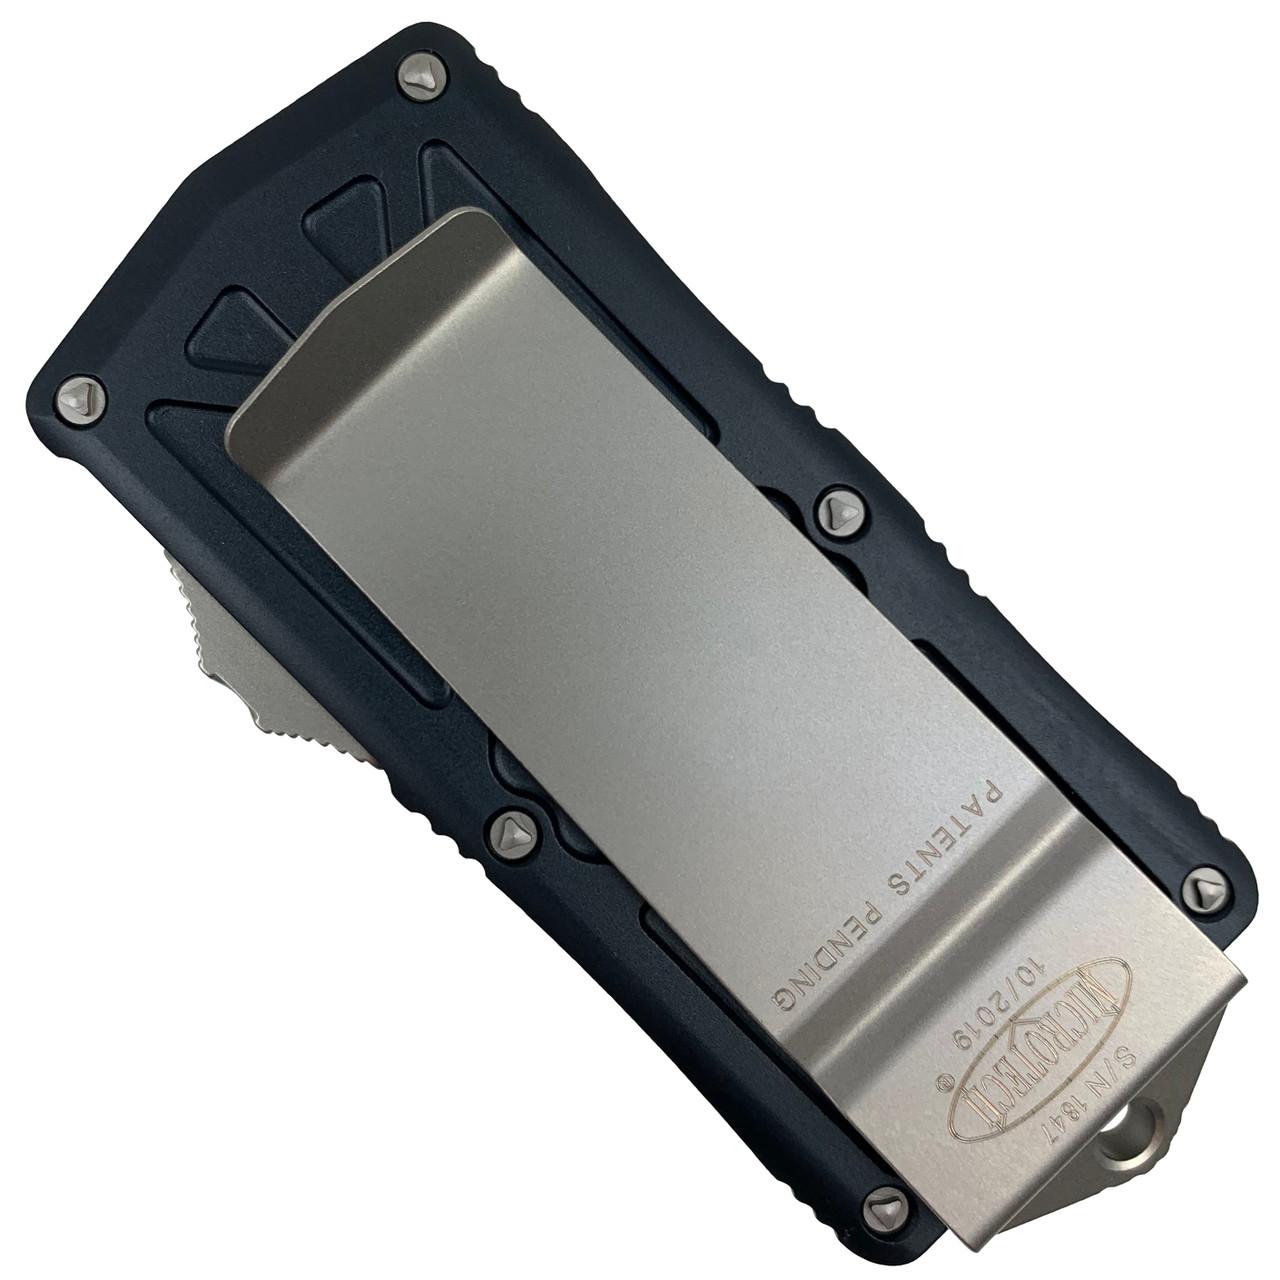 Microtech Exocet OTF Auto Knife, Stonewash Blade REAR VIEW